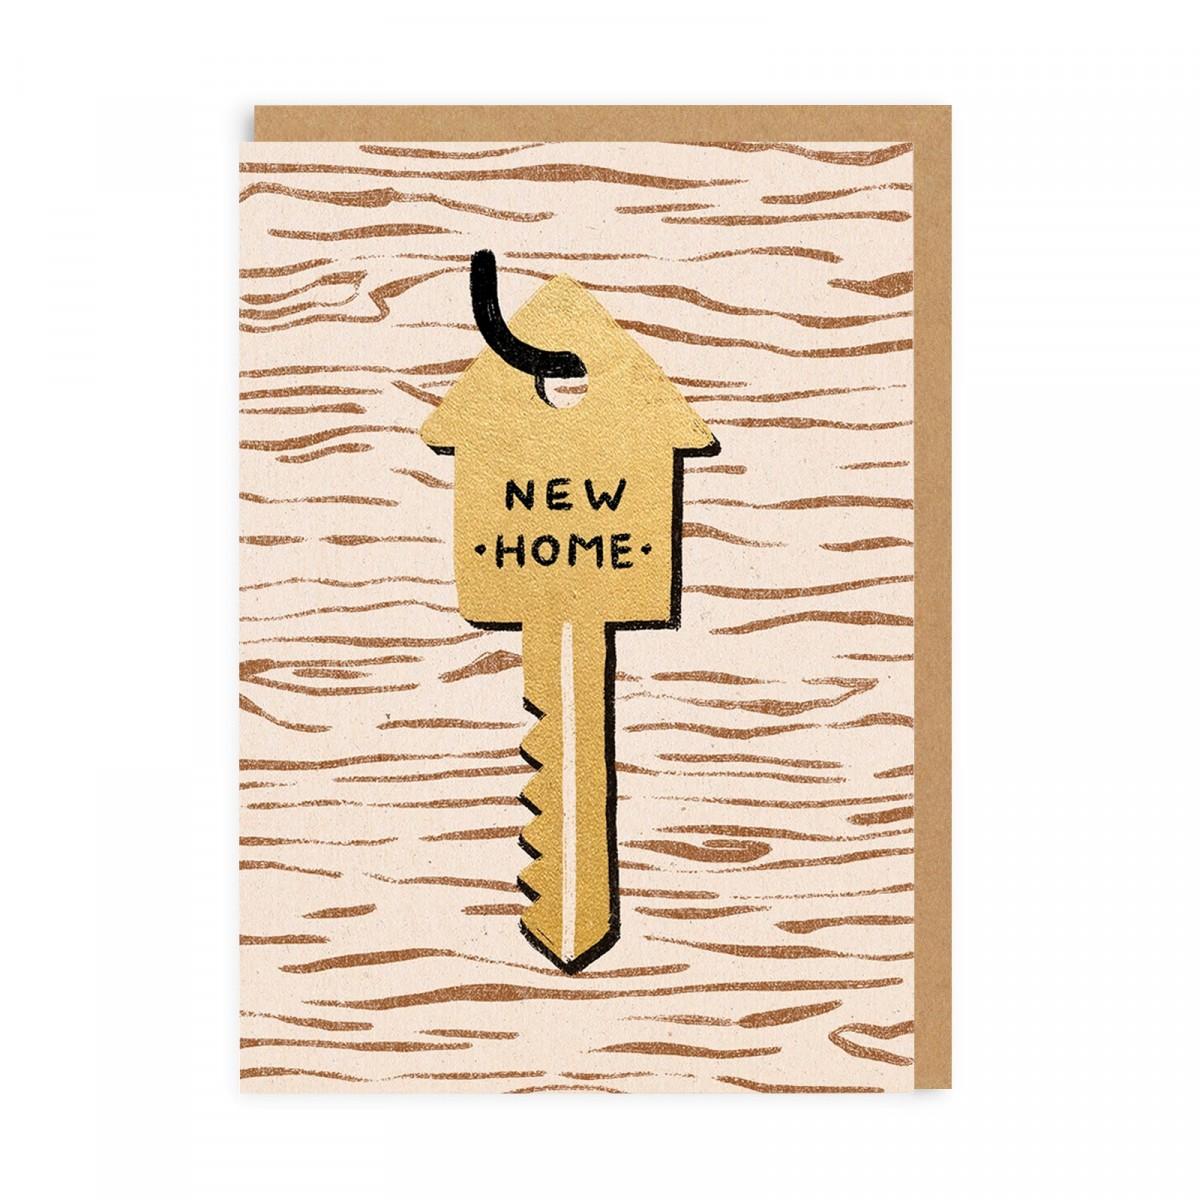 New Home Key.jpg